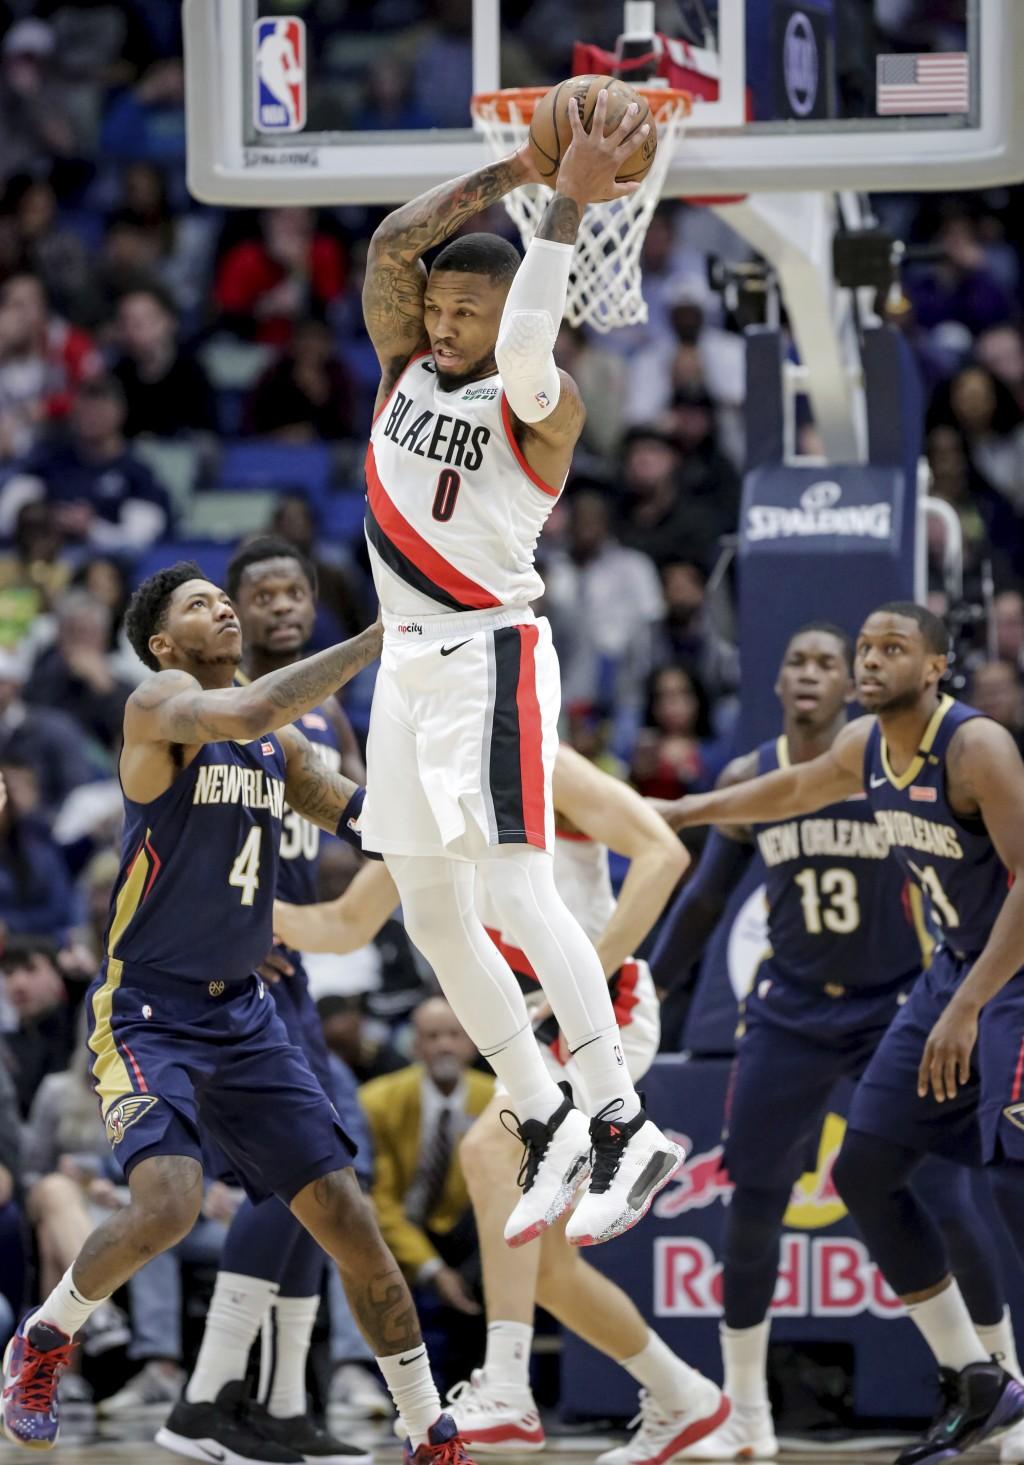 Portland Trail Blazers guard Damian Lillard (0) grabs a rebound against New Orleans Pelicans guard Elfrid Payton (4) in the first half of an NBA baske